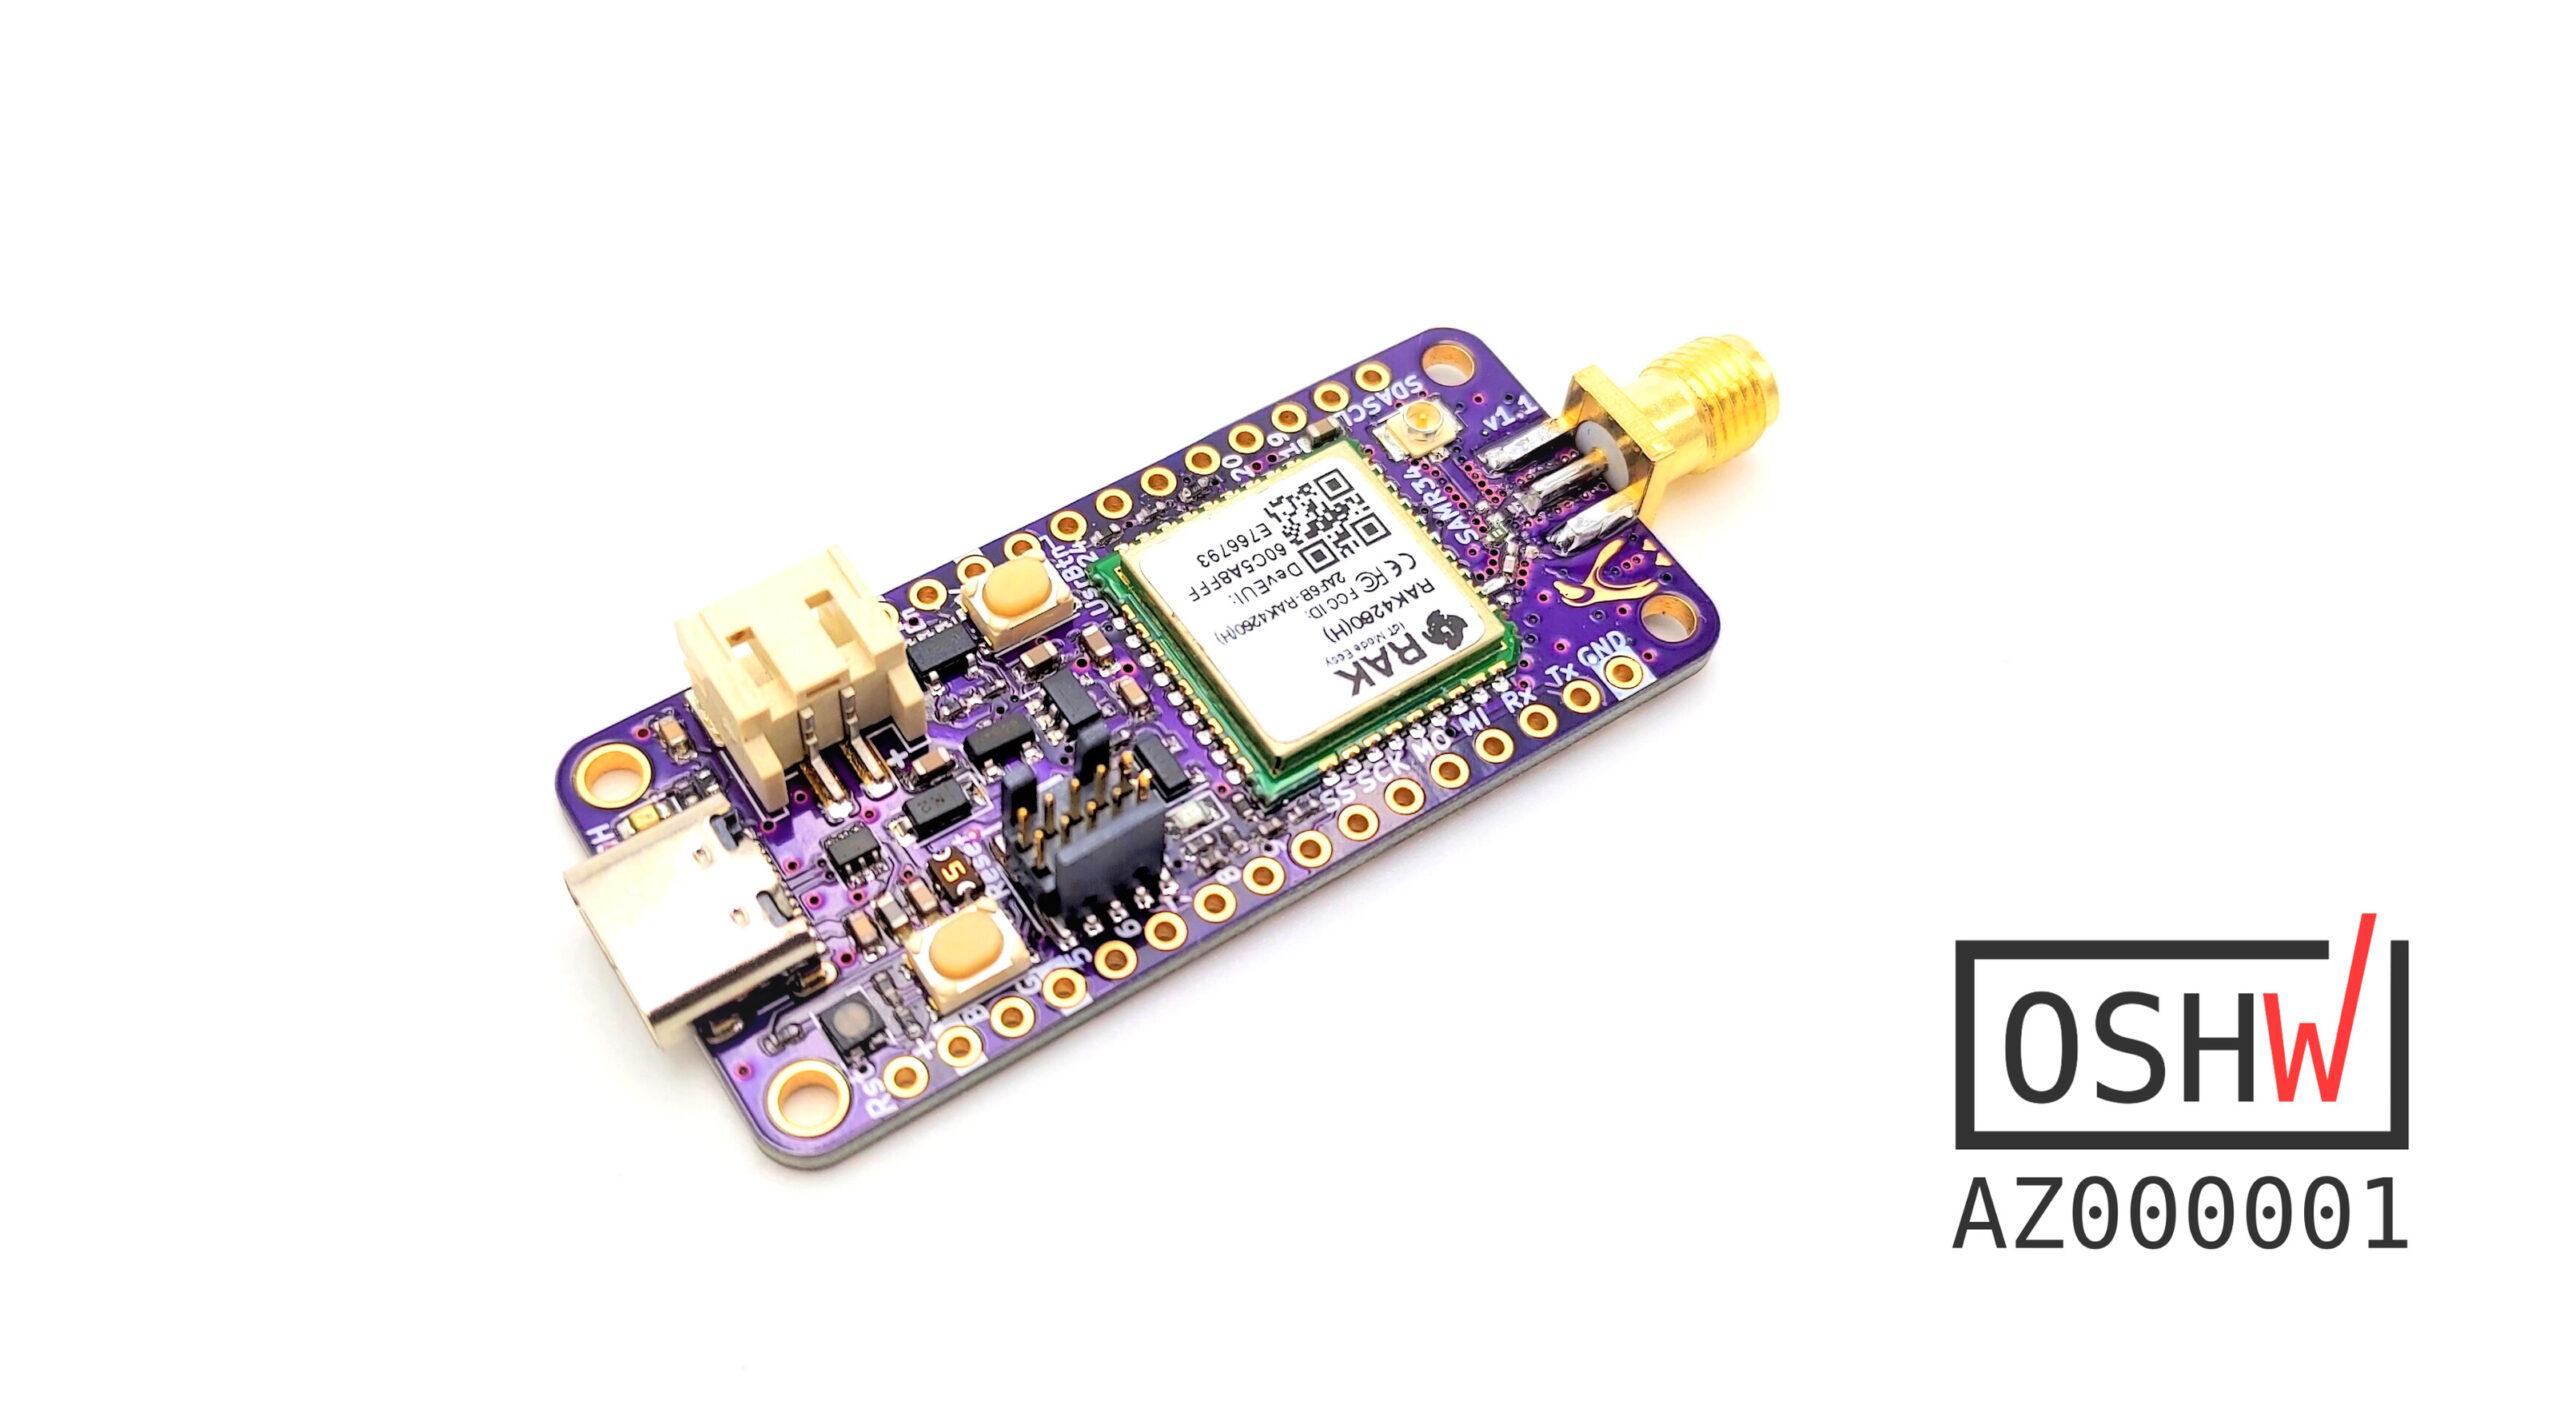 Penguino Feather 4260 SAMR34 based LoRa Dev-Board Features RAK4260 module